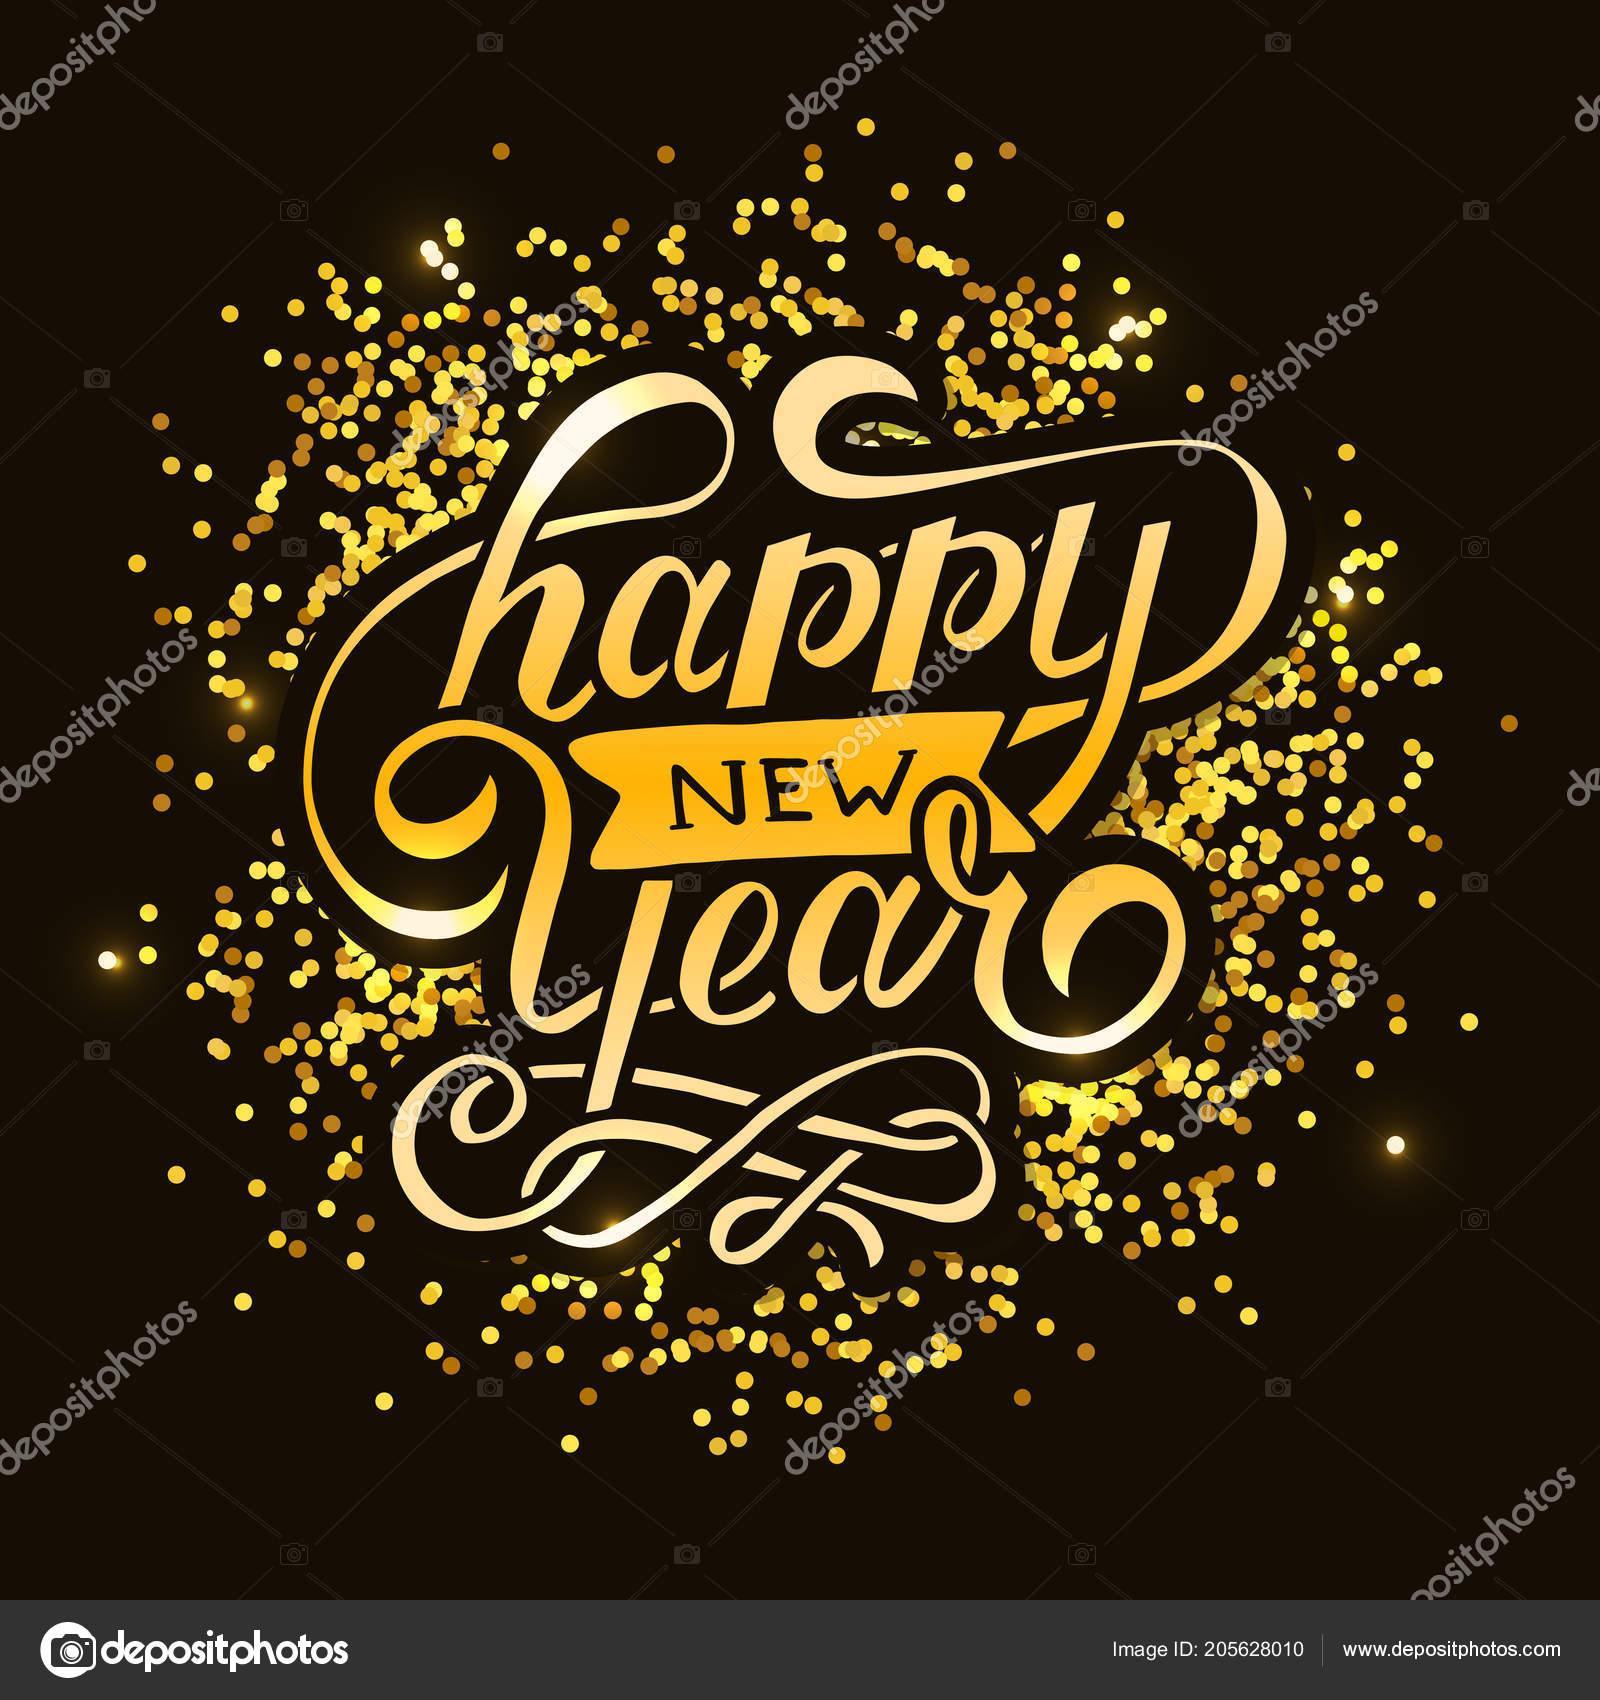 happy new year vector gradient phrase lettering calligraphy illustration sticker stock vector c lemonkey 205628010 https depositphotos com 205628010 stock illustration happy new year vector gradient html